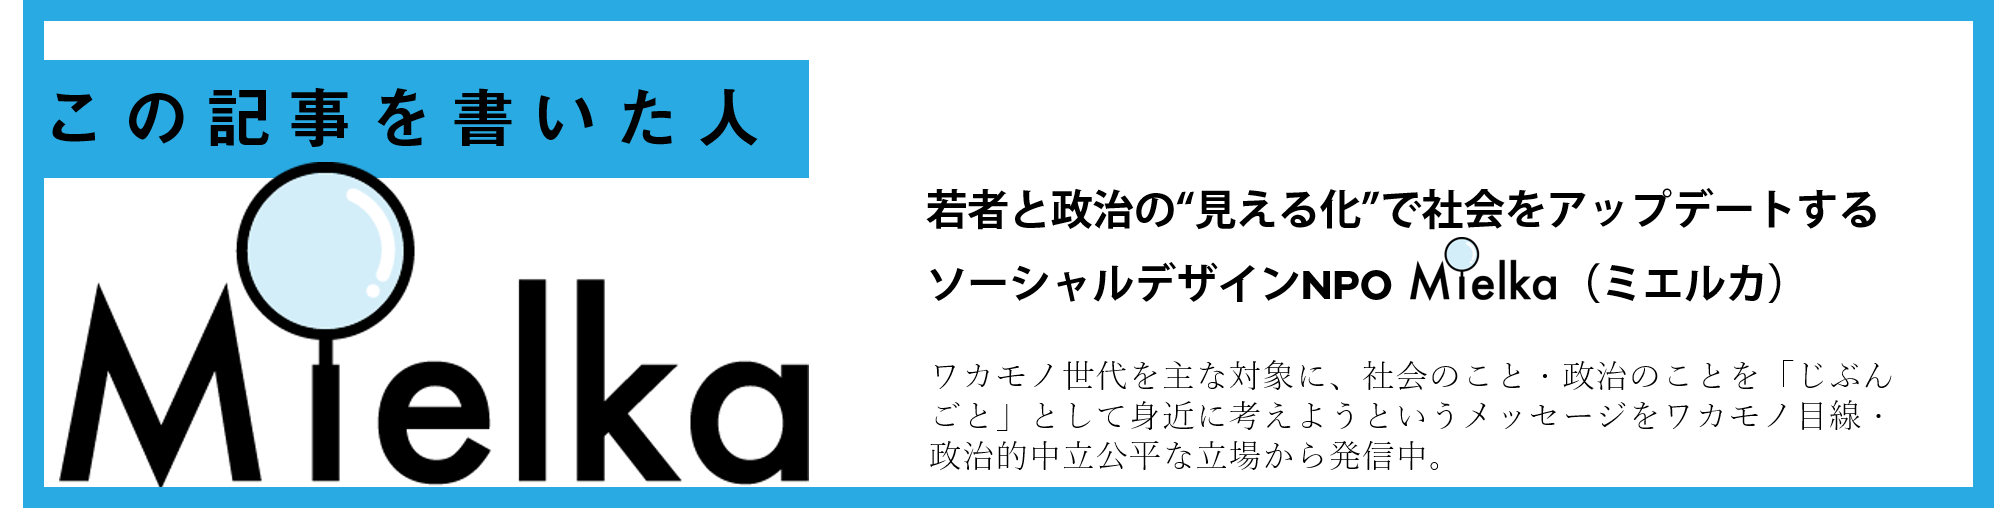 3098b23716f5a73744d6d610c7025dde - 【働き方改革】公約比較-15の争点- 2017衆議院議員総選挙